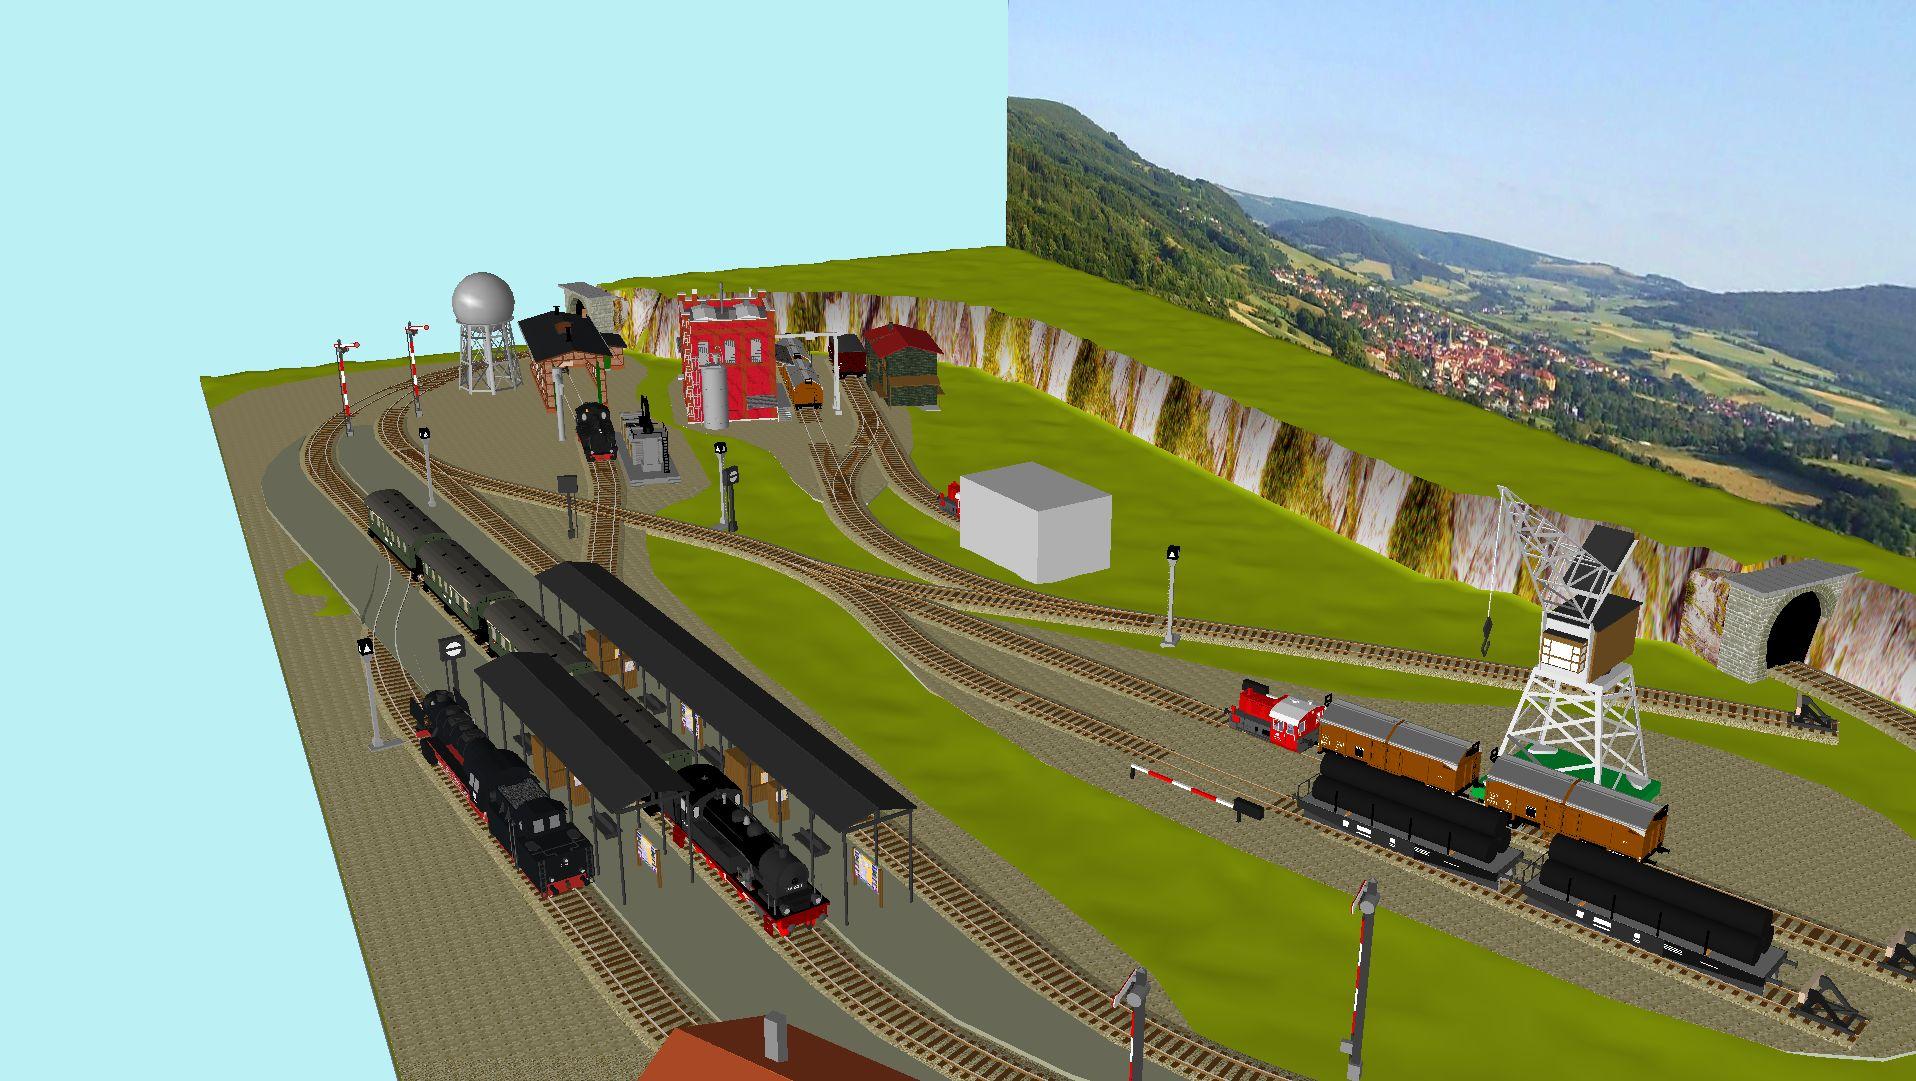 'ALBA Modellbahnpraxis' Band 1, Plan 5 Amp-1_5_m-gleis_jrg_affkgr